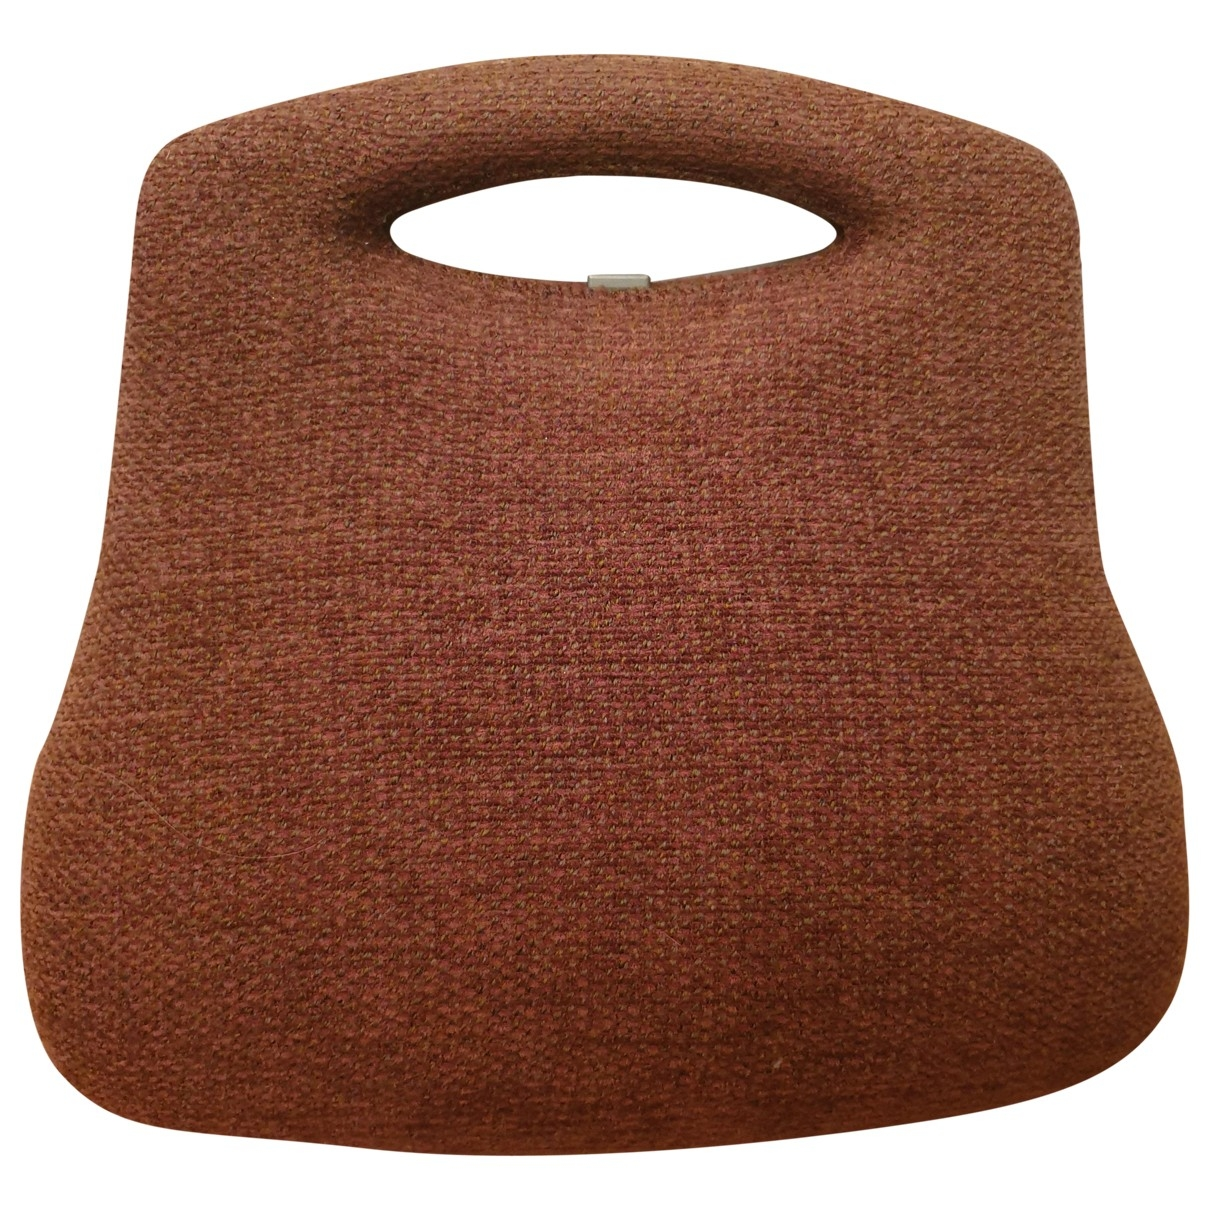 Chanel Millenium Brown Wool Clutch bag for Women \N